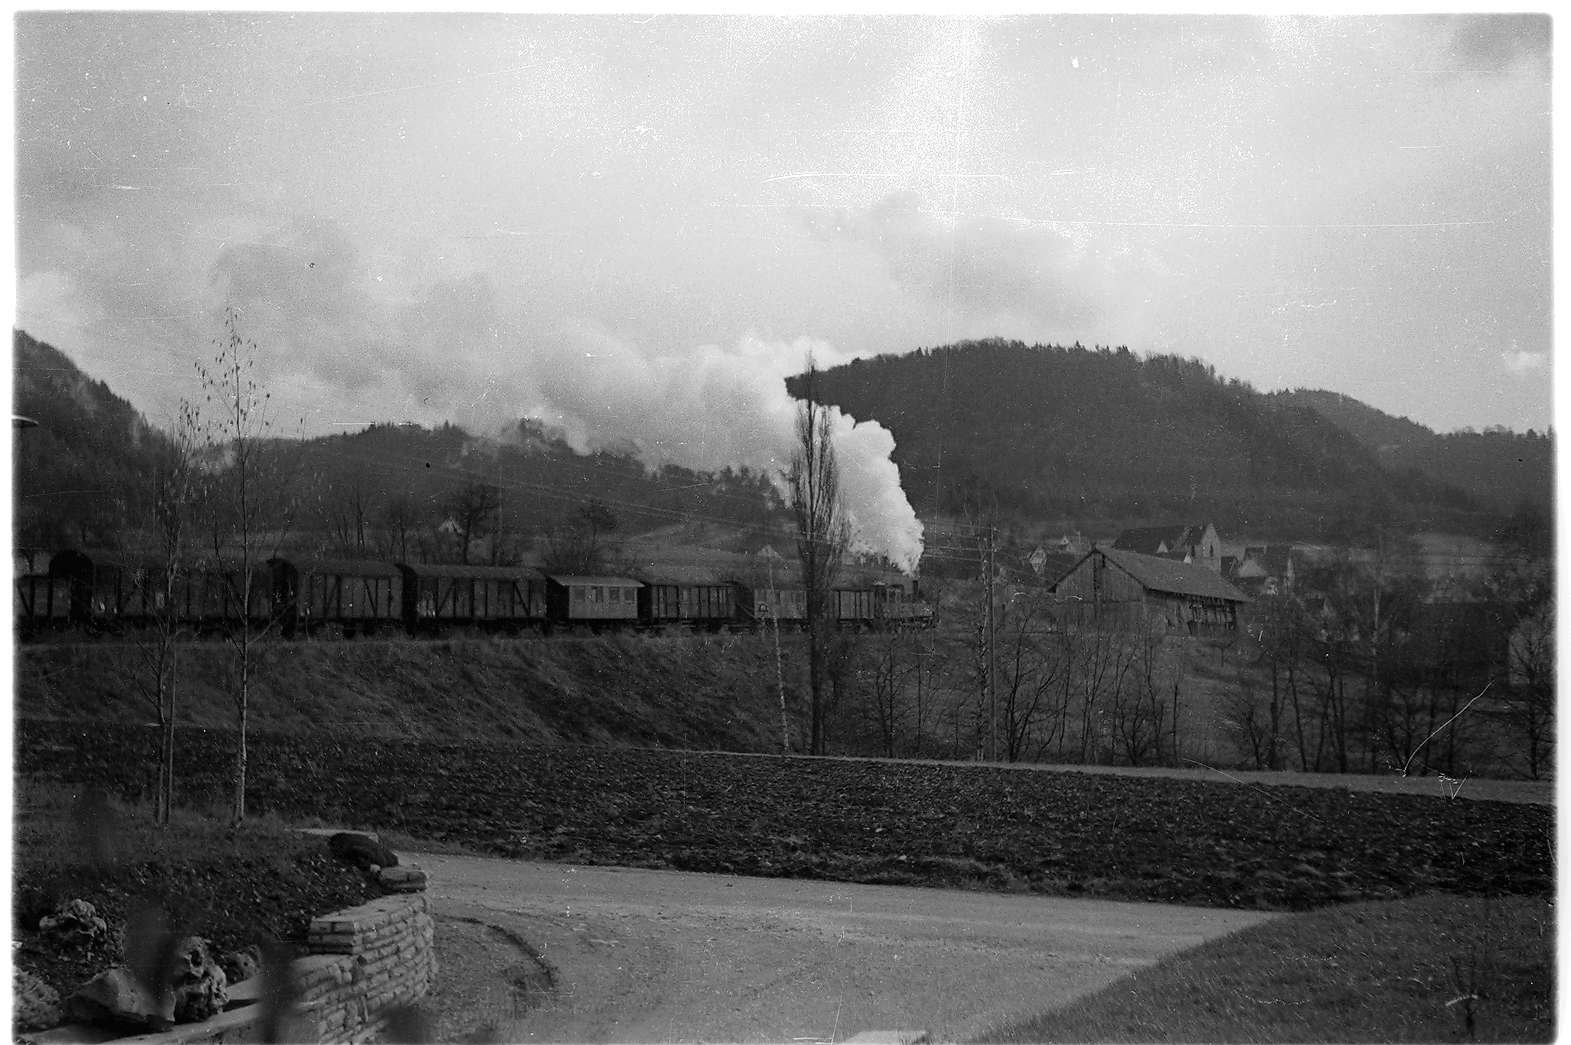 Lok 21, Einfahrt Bahnhof Killer, Kirche Mater Dolorosa, noch niedriger Kirchturm, Bild 1